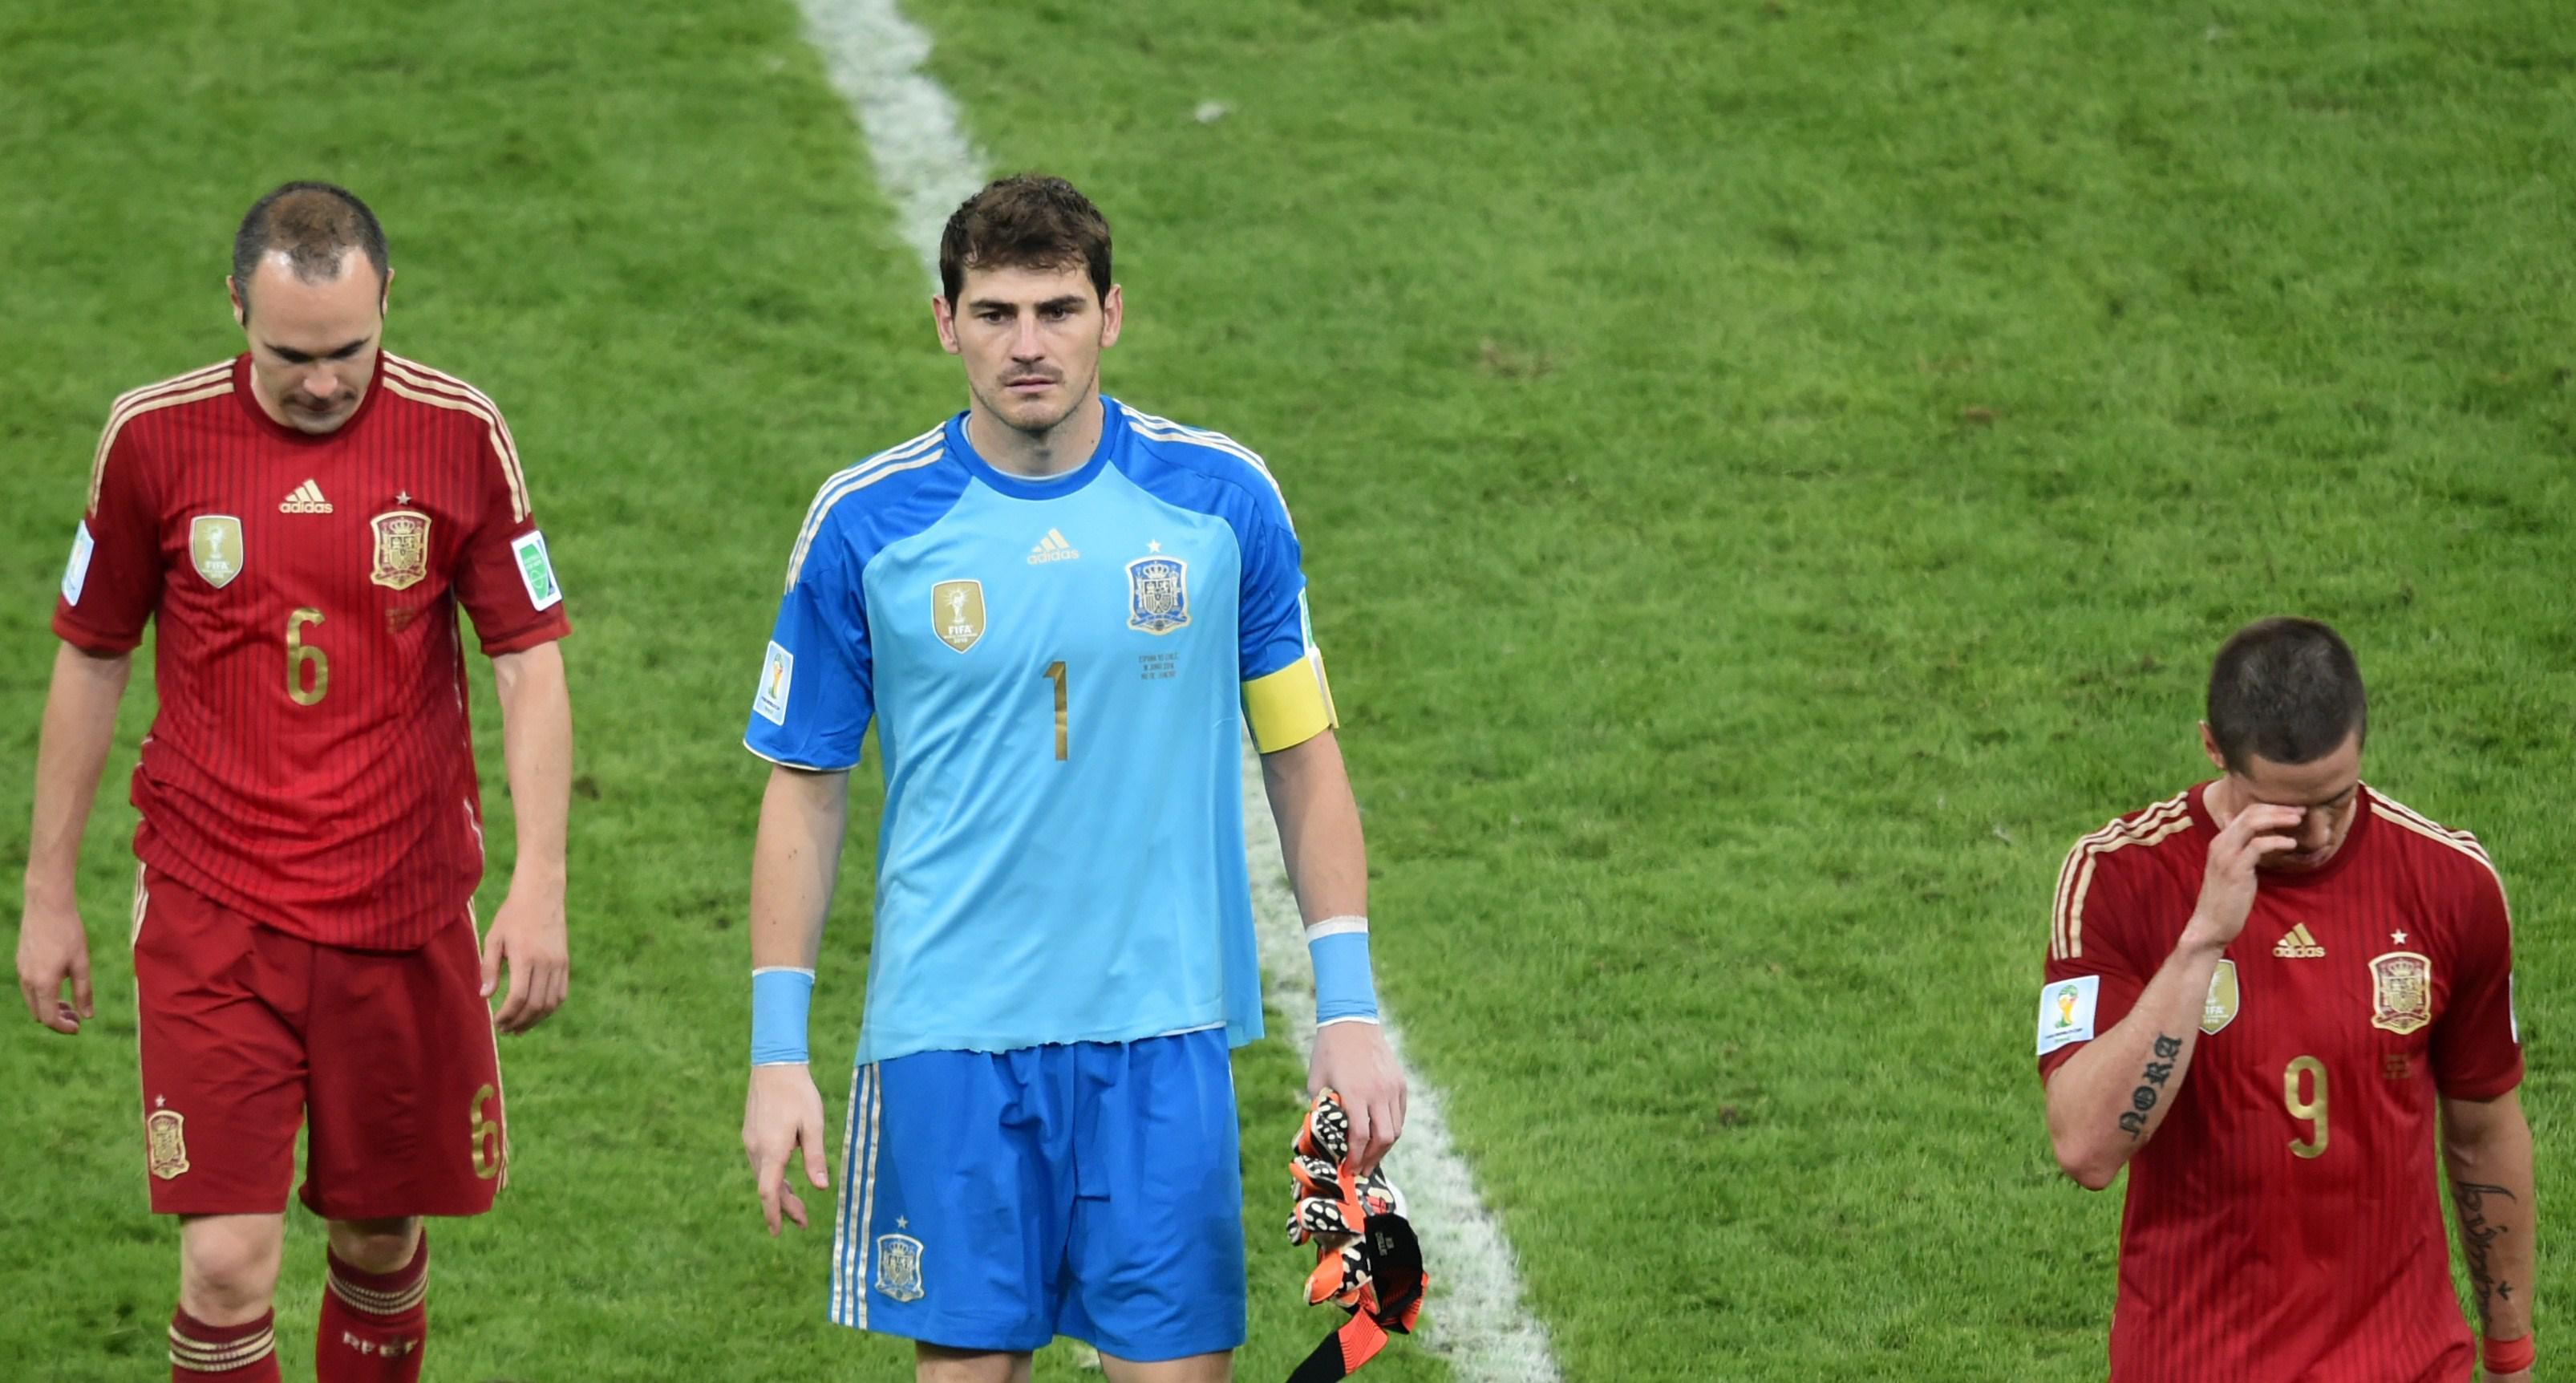 Andrés Iniesta and Iker Casillas